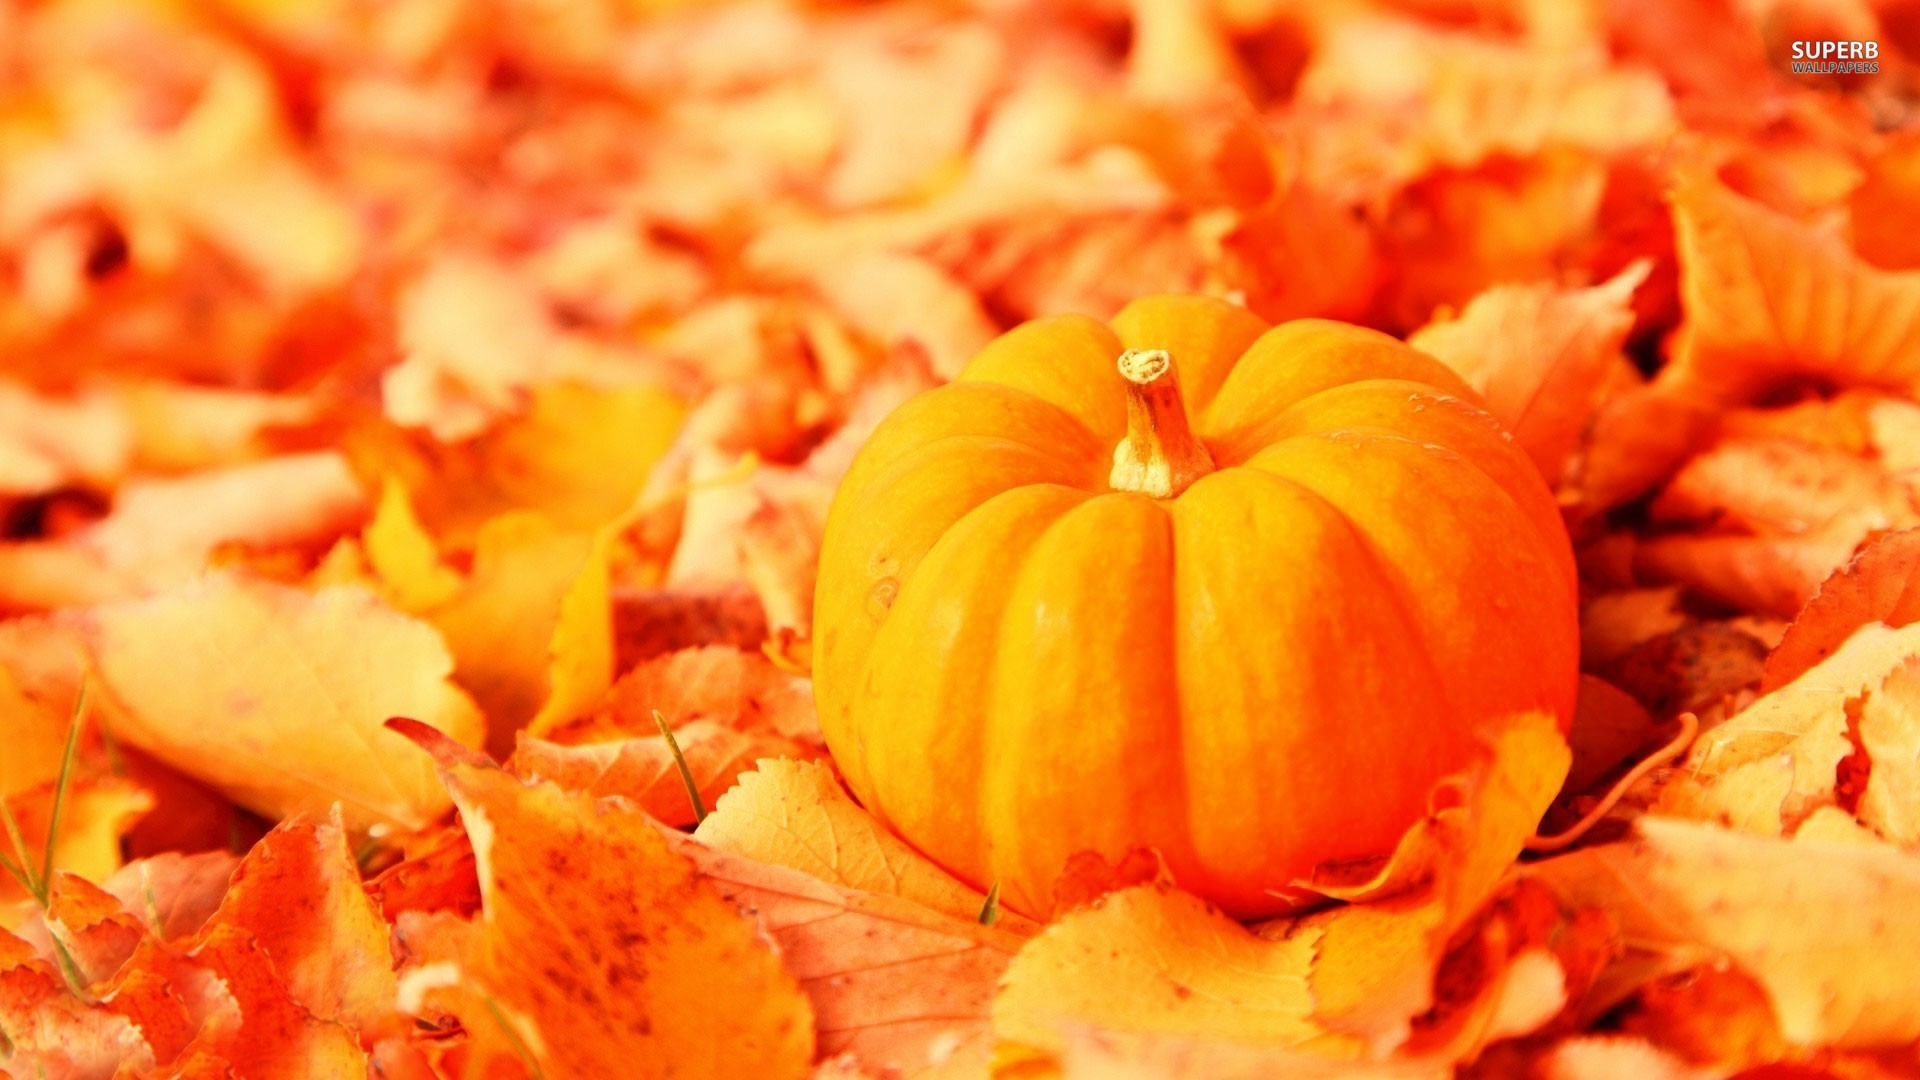 Fall Pumpkin Wallpaper and Screensavers 63 images